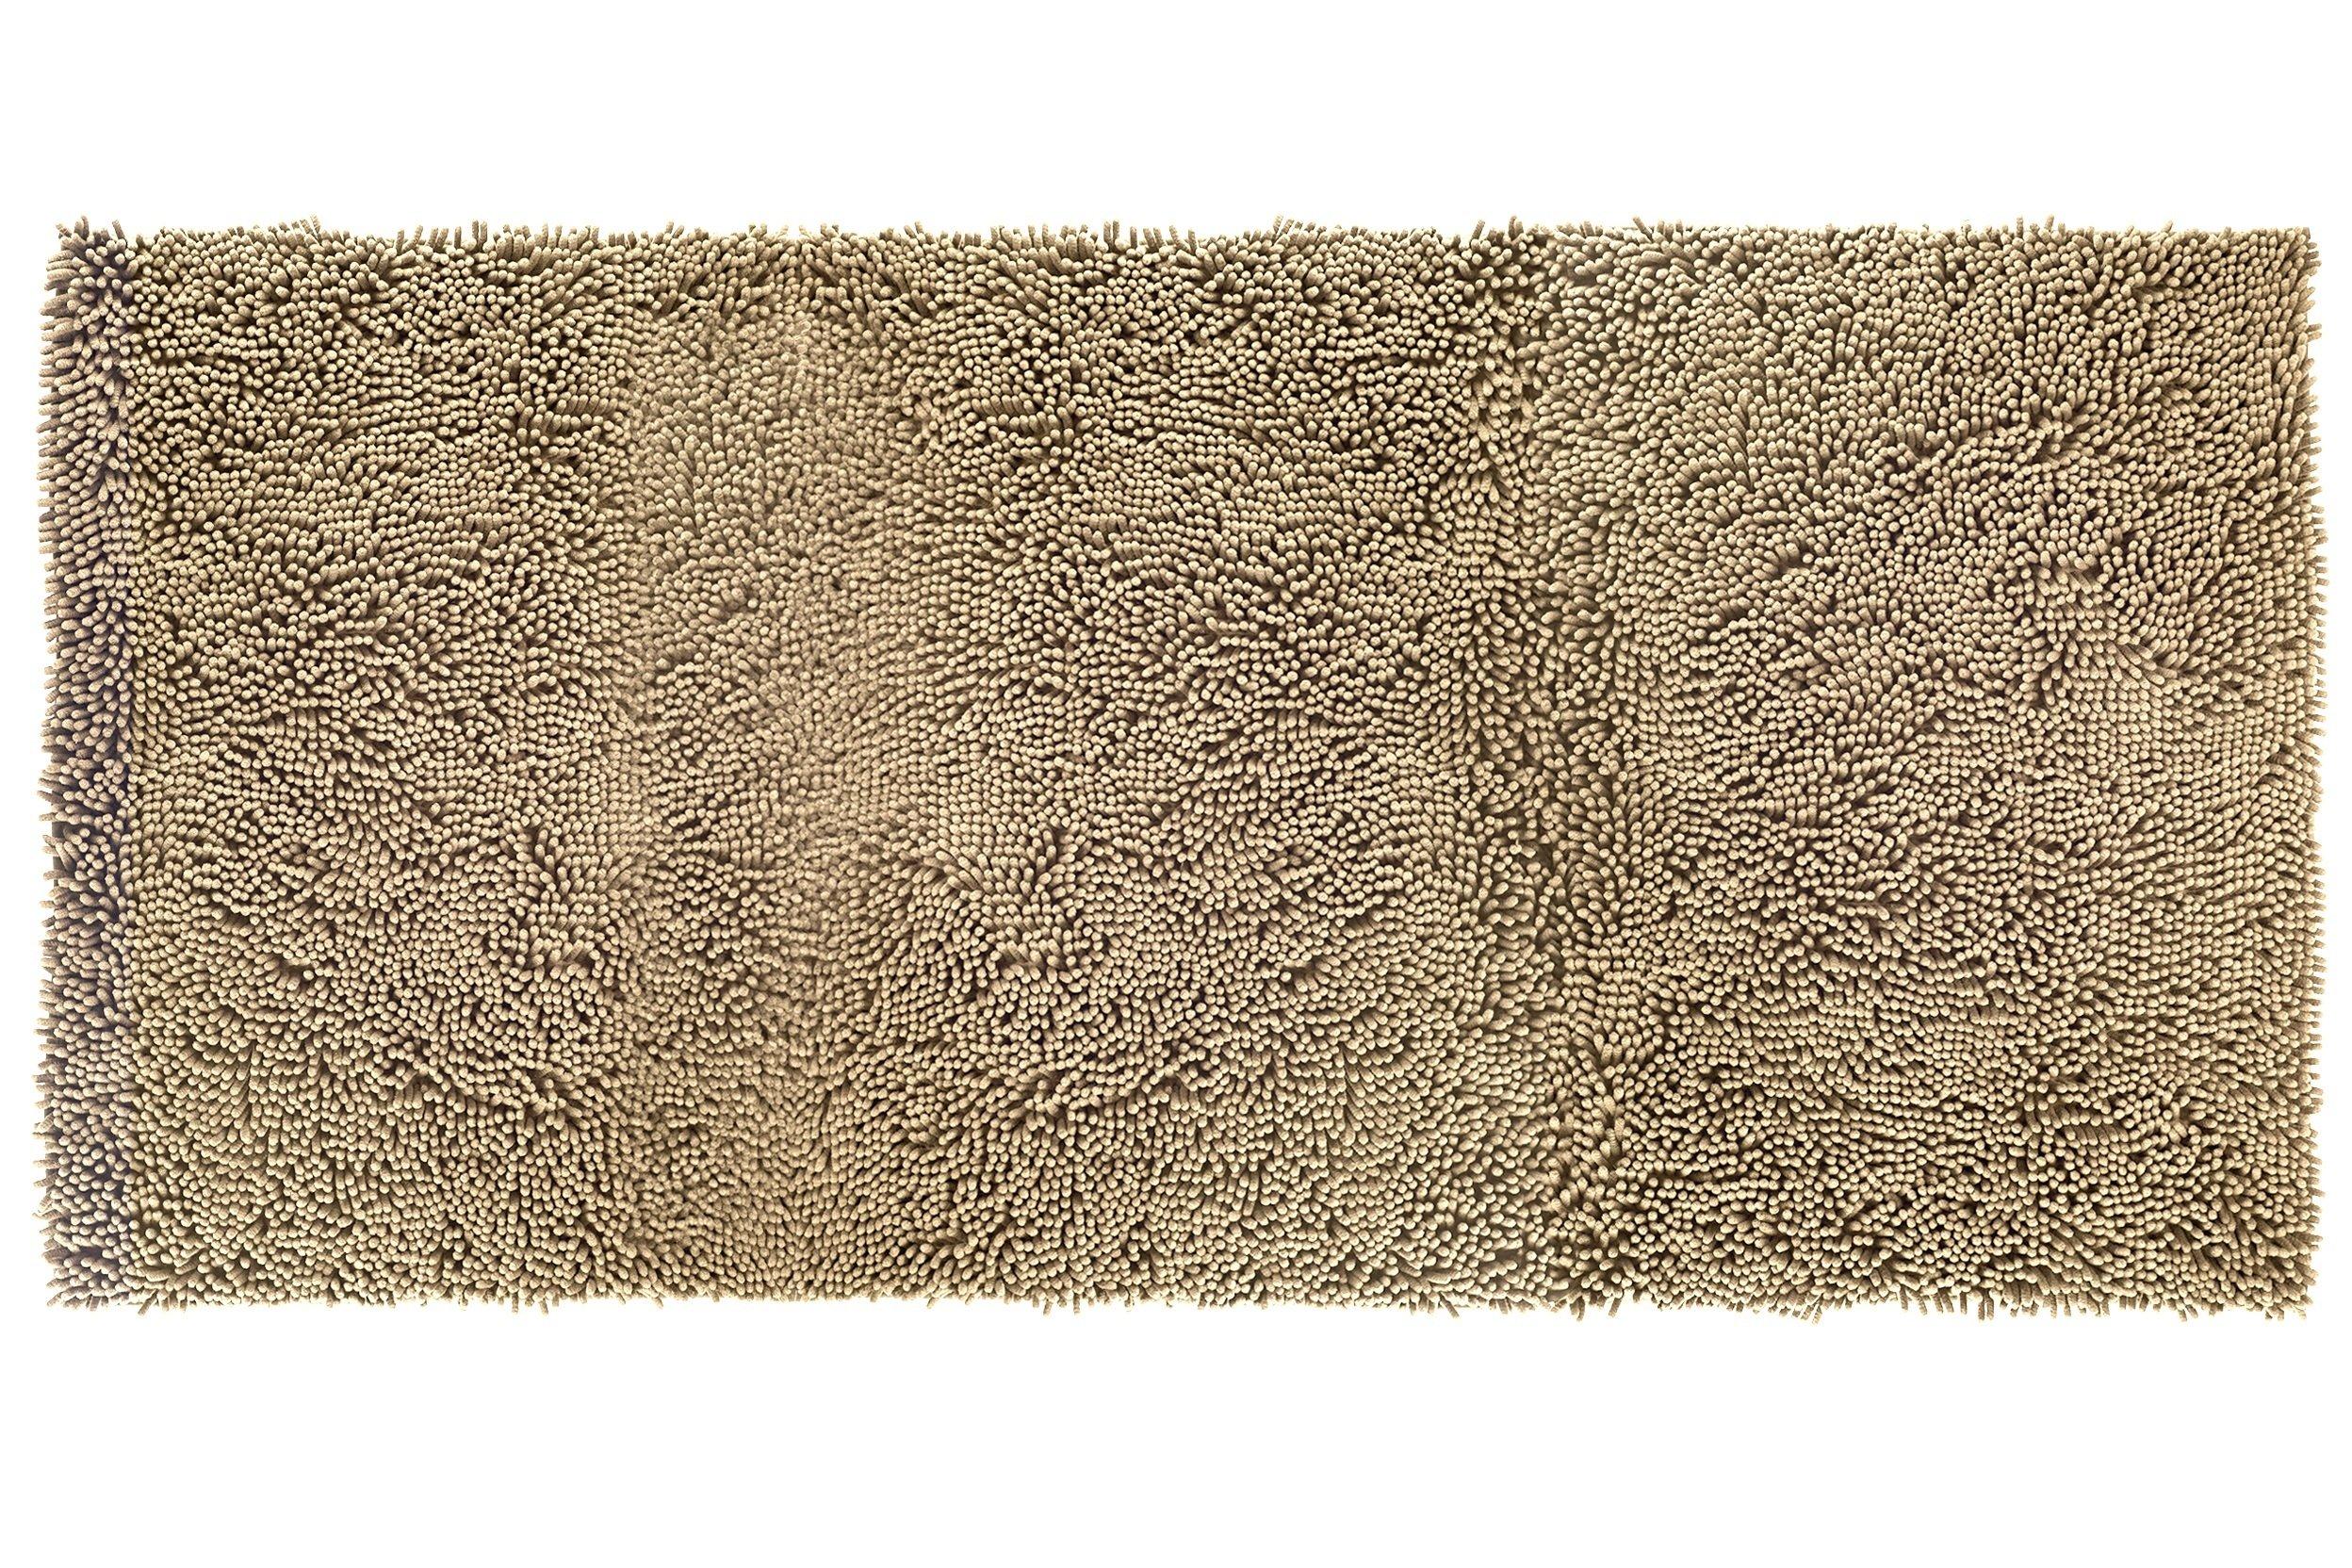 Furhaven Pet 80551613 Runner Muddy Paws Towel & Shammy Rug - Sand by Furhaven Pet (Image #3)